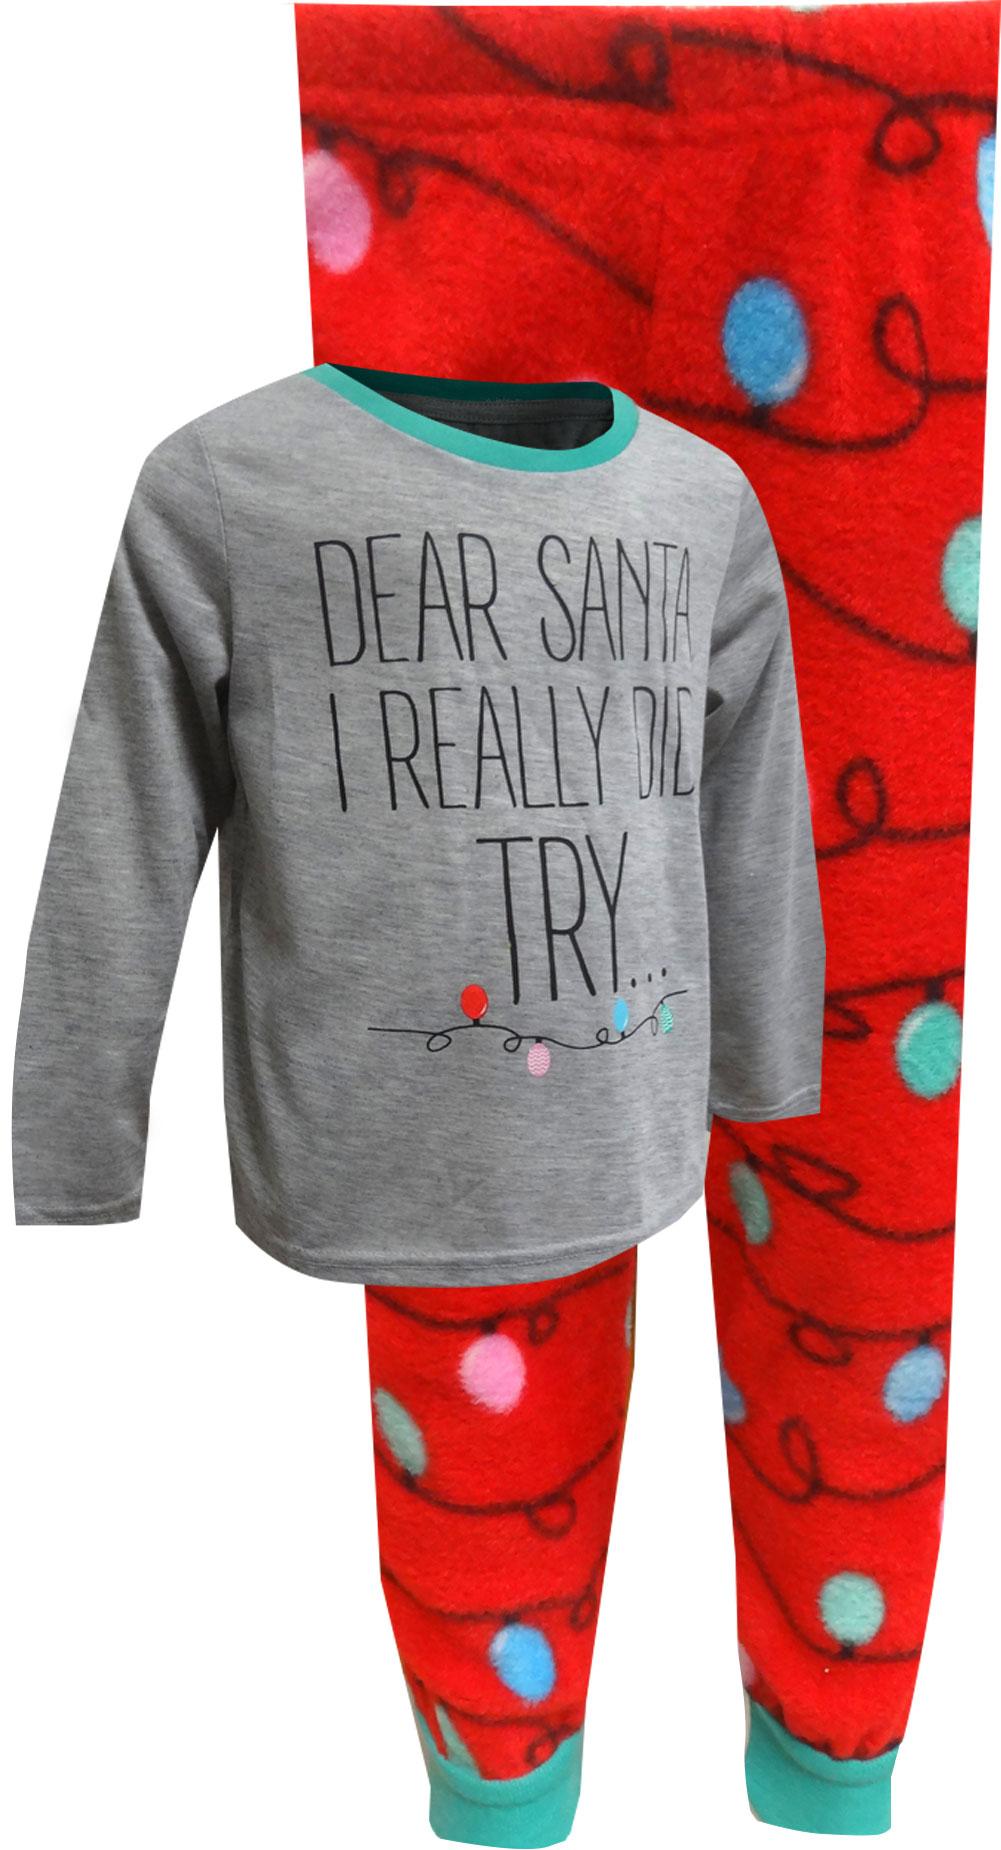 Image of Fun Dear Santa Christmas Pajamas for Boys